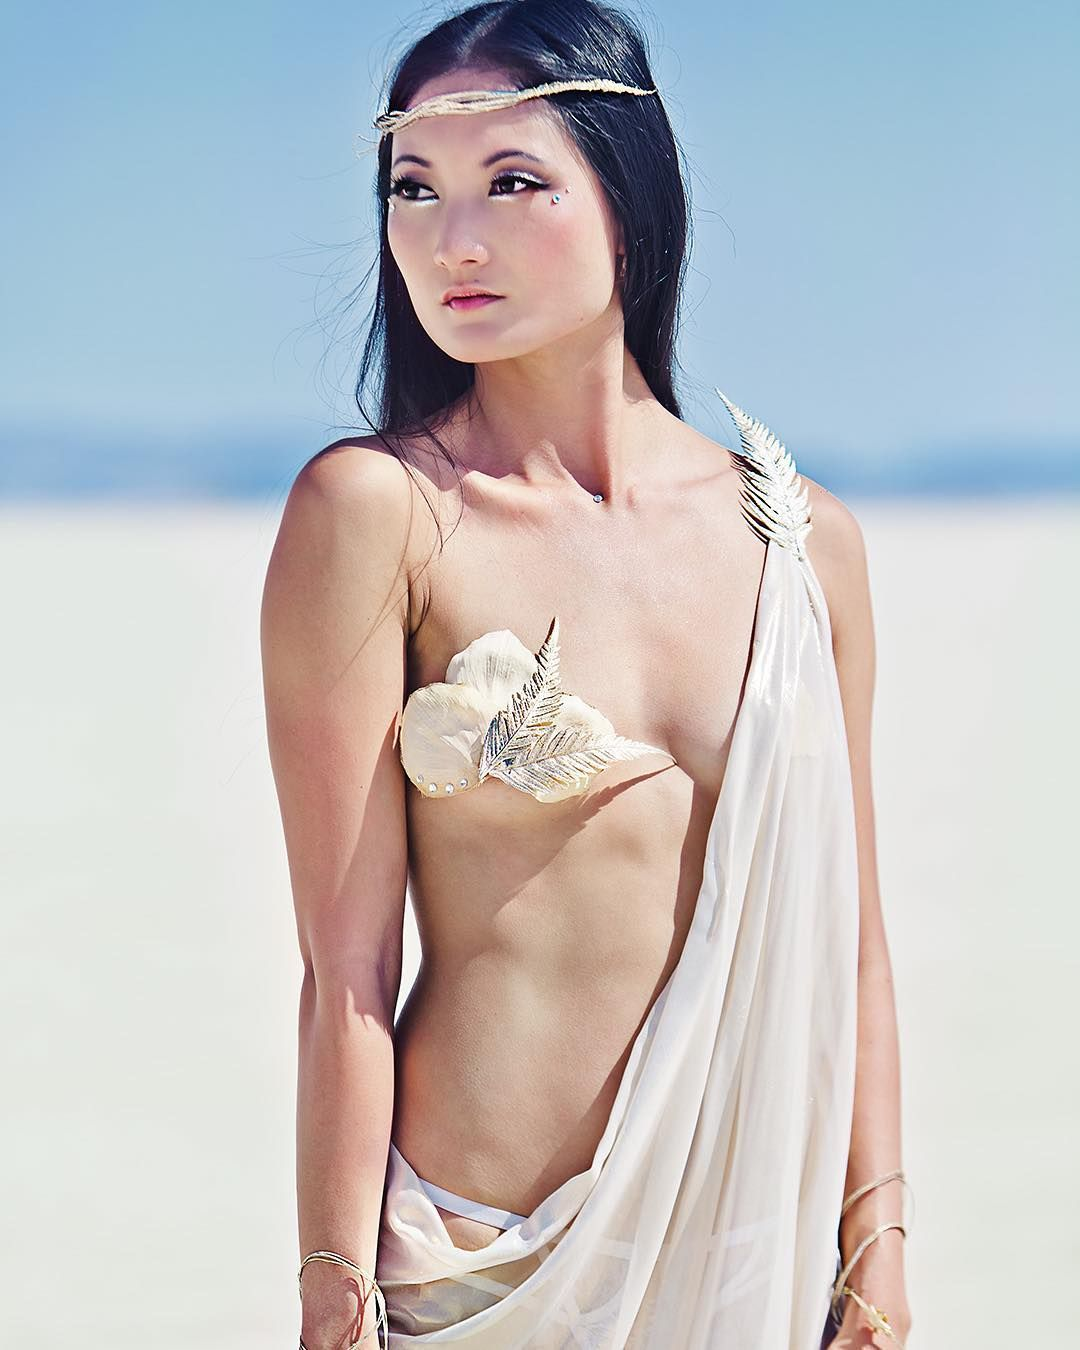 ICloud Rachel Escudero naked (14 photo), Topless, Paparazzi, Feet, butt 2019